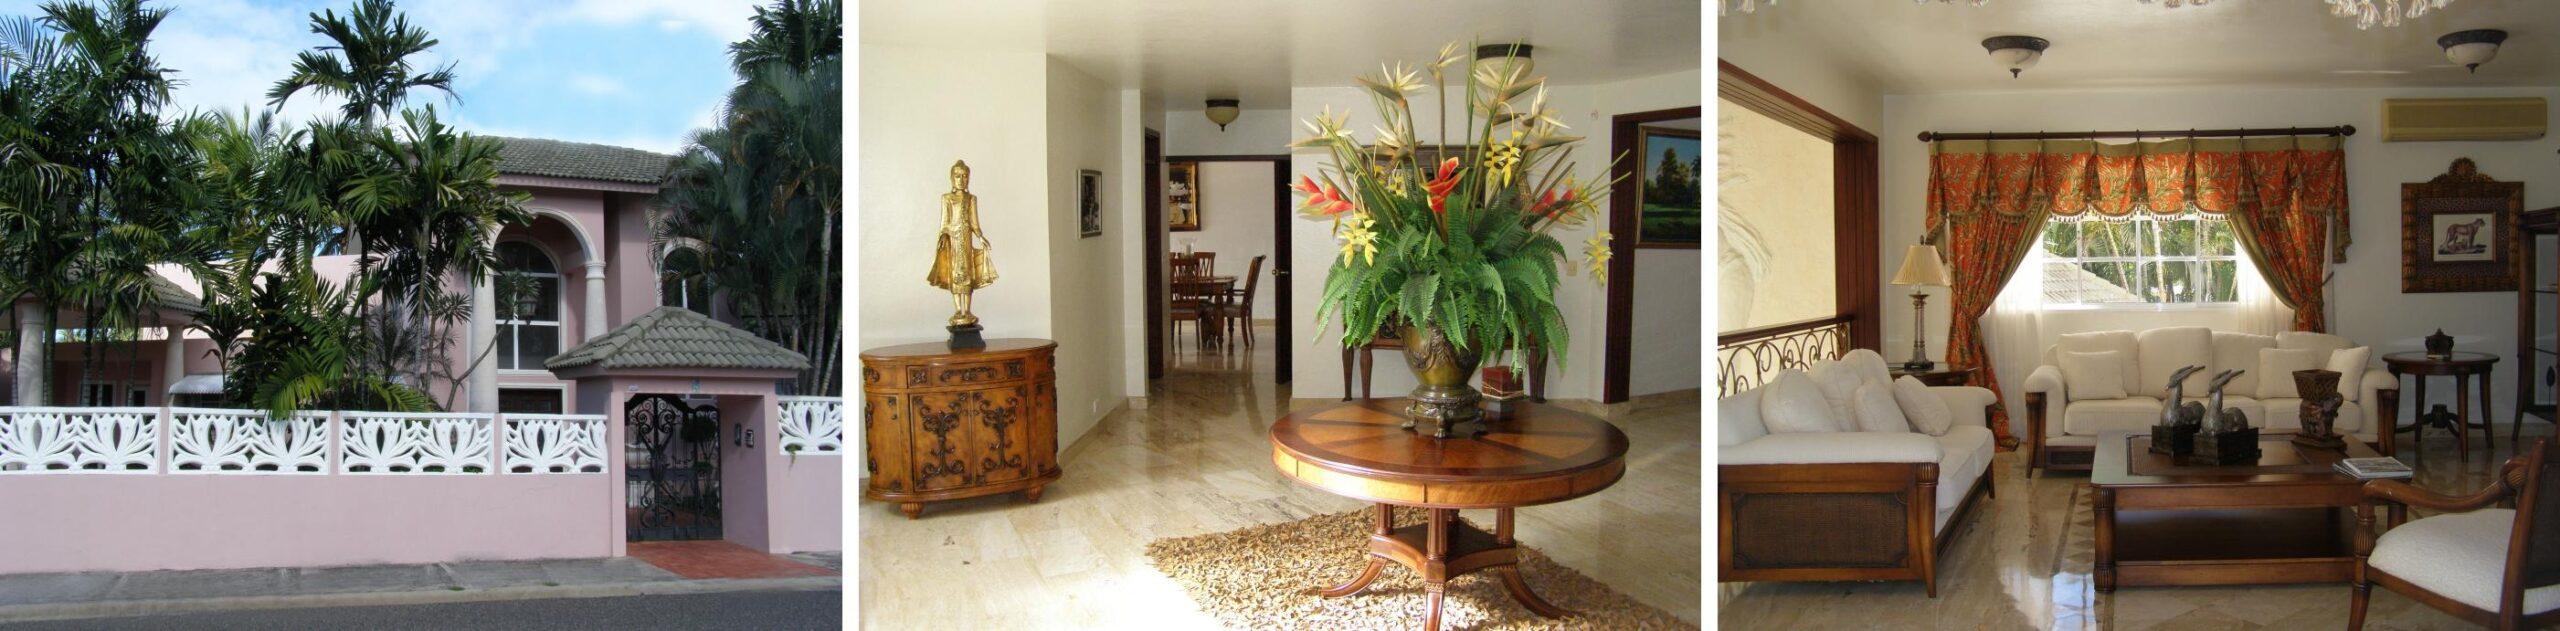 luxury house in Puerto Plata